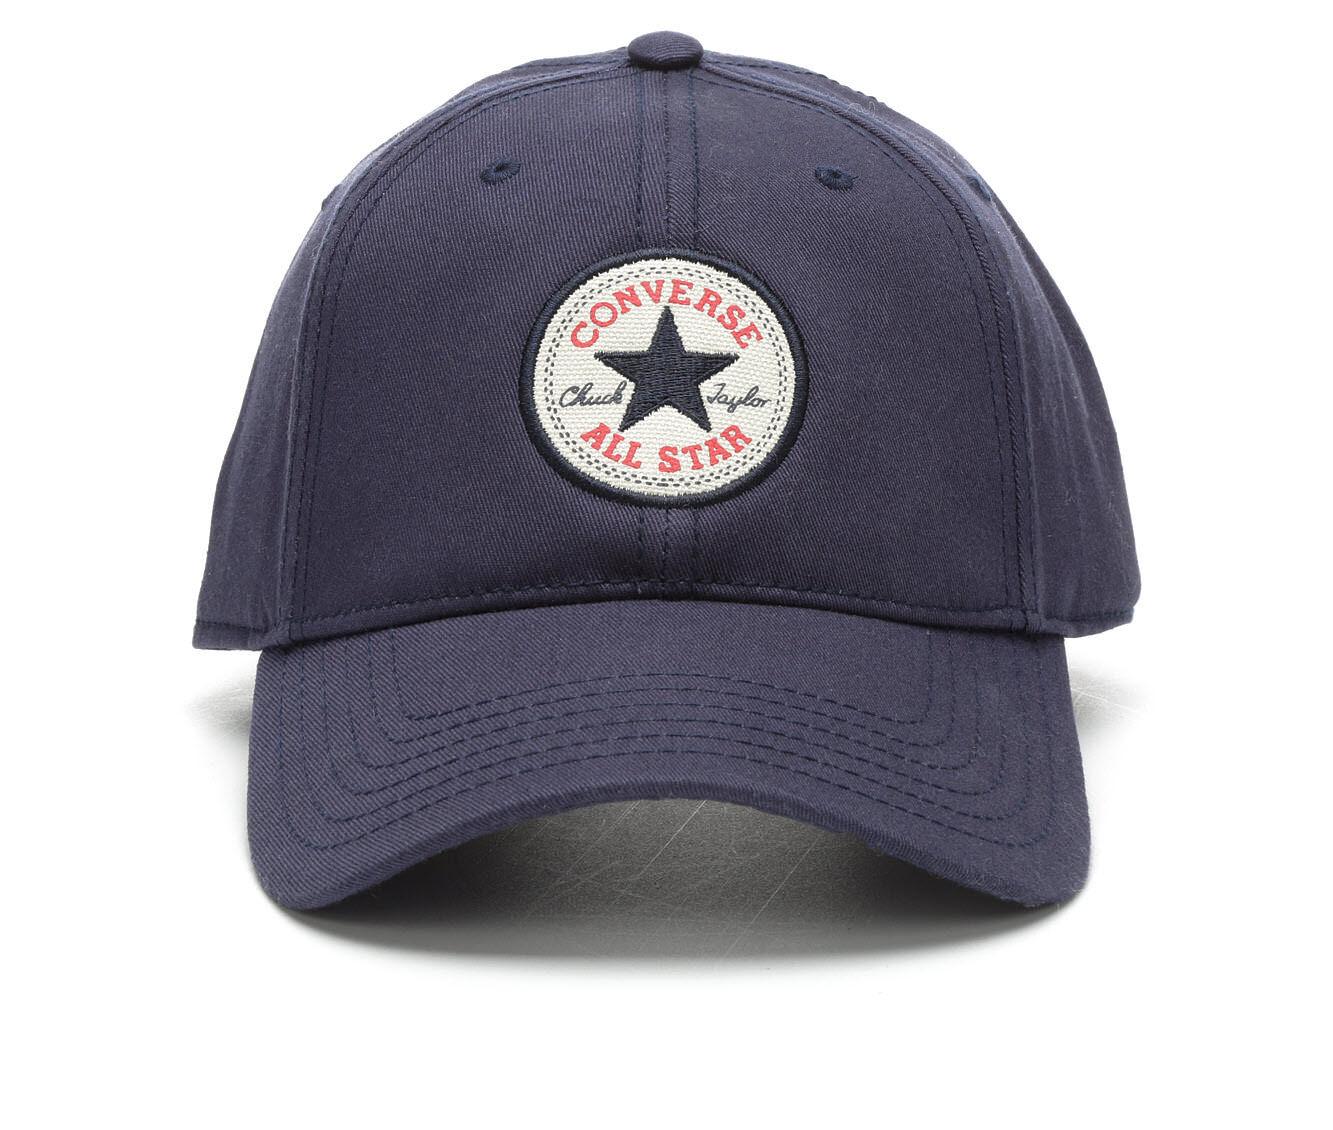 converse trucker hat